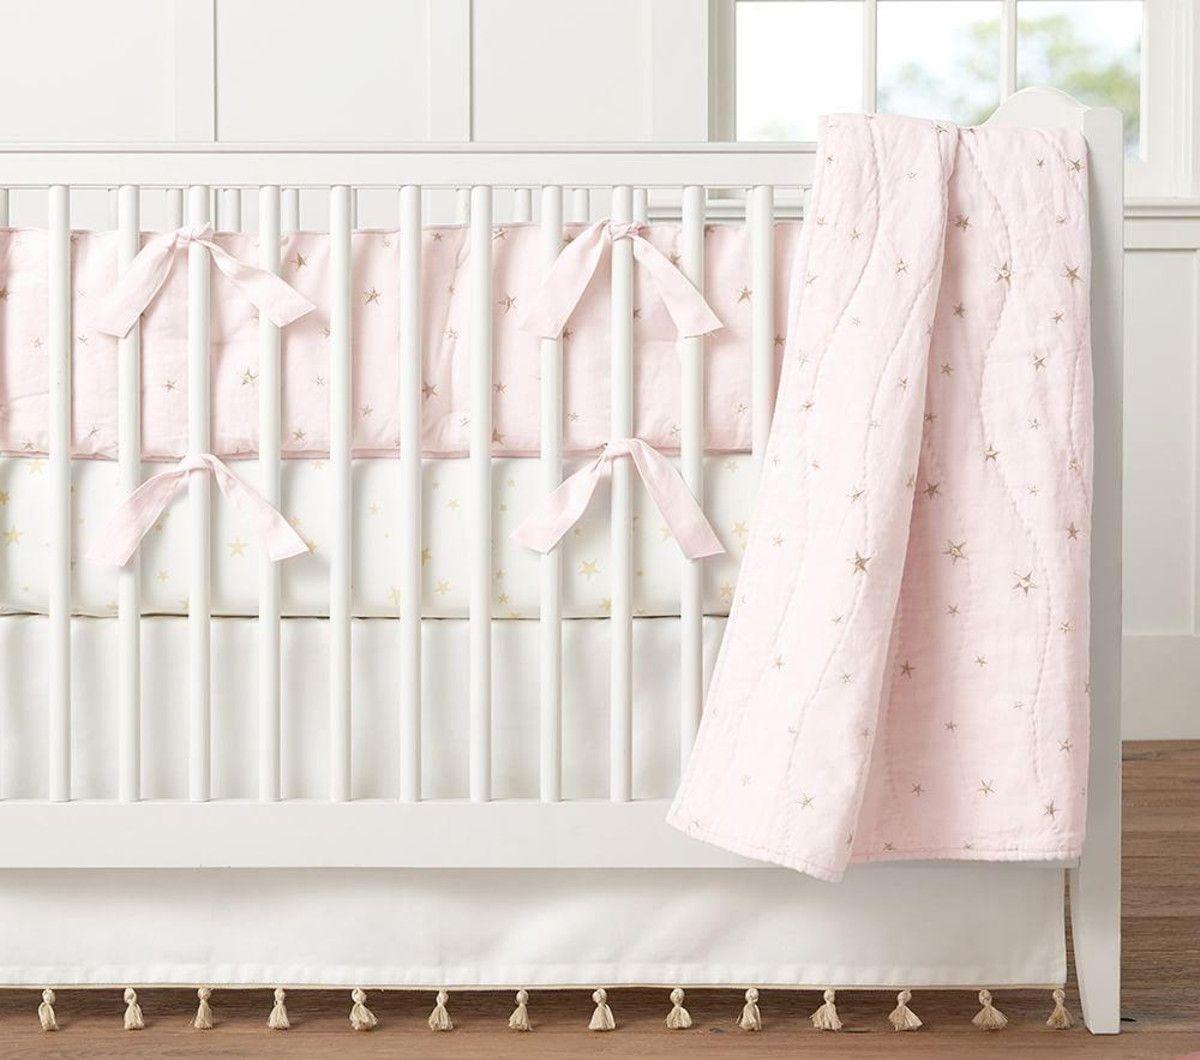 Organic Emily & Meritt Stars Nursery Bed Linen, Light Pink